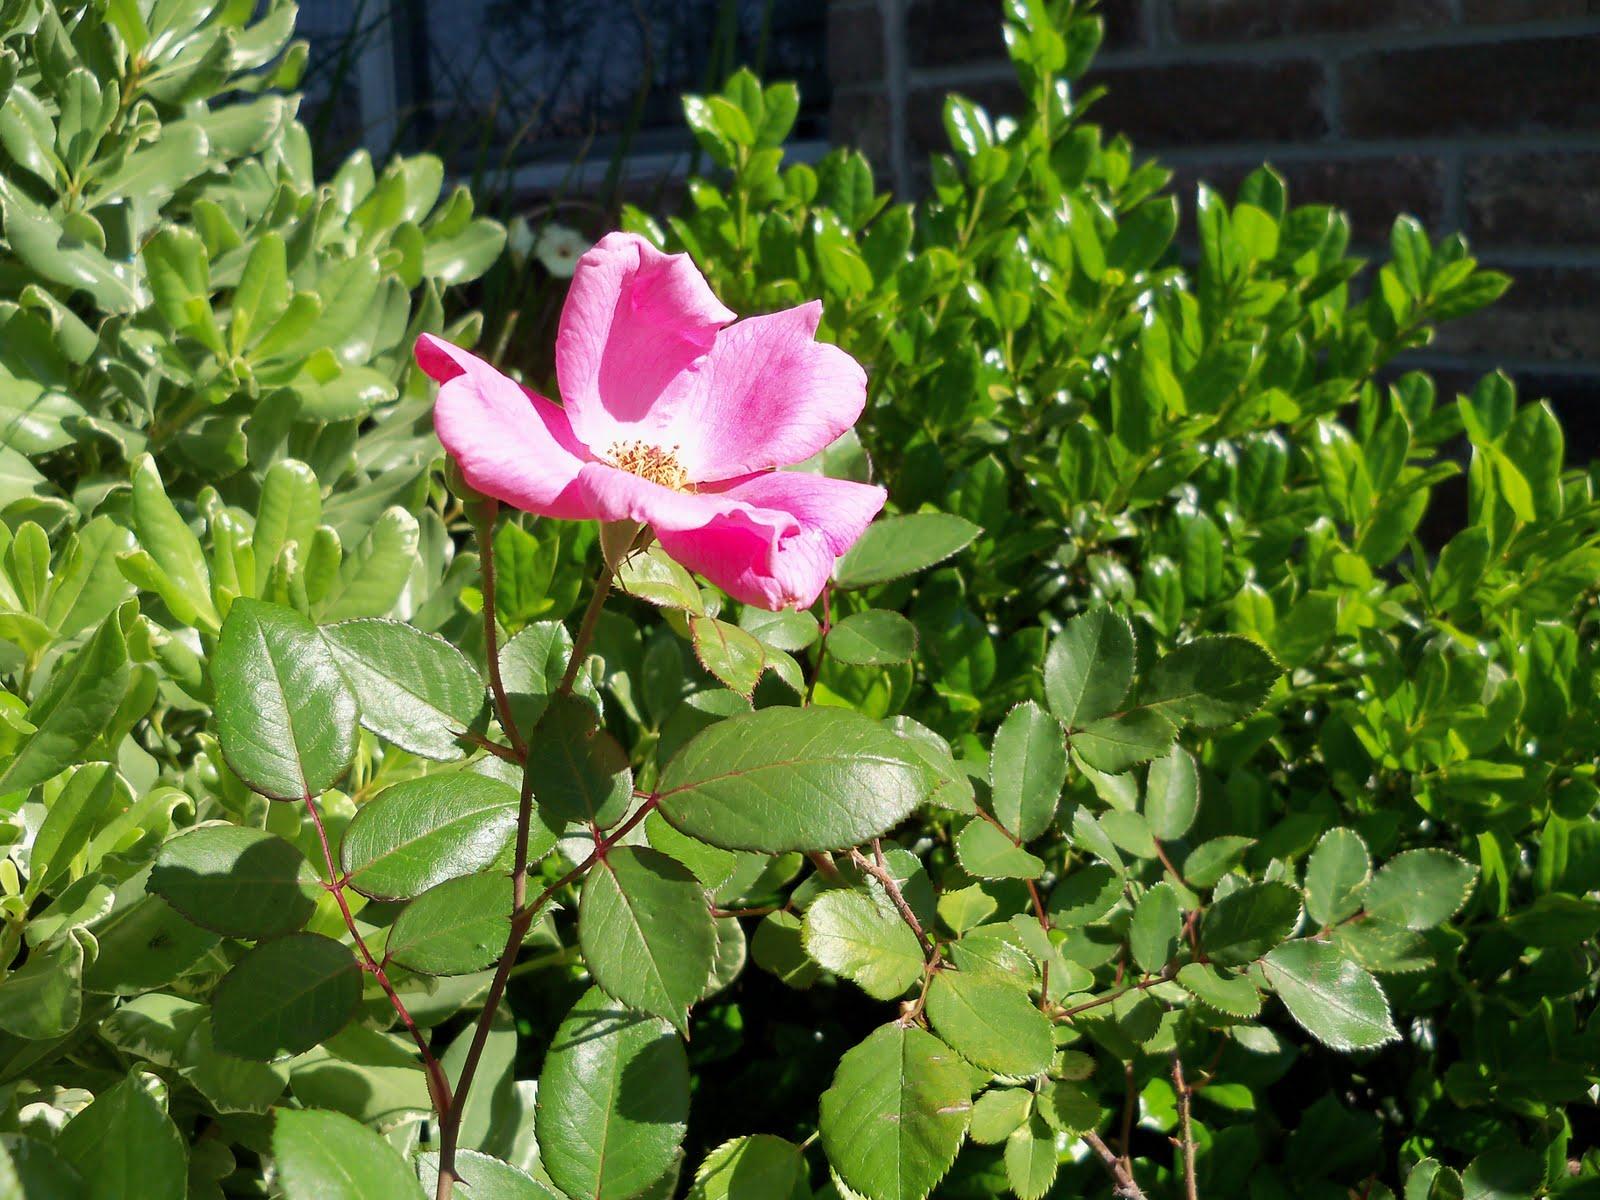 Gardening 2010 - 101_1369.JPG